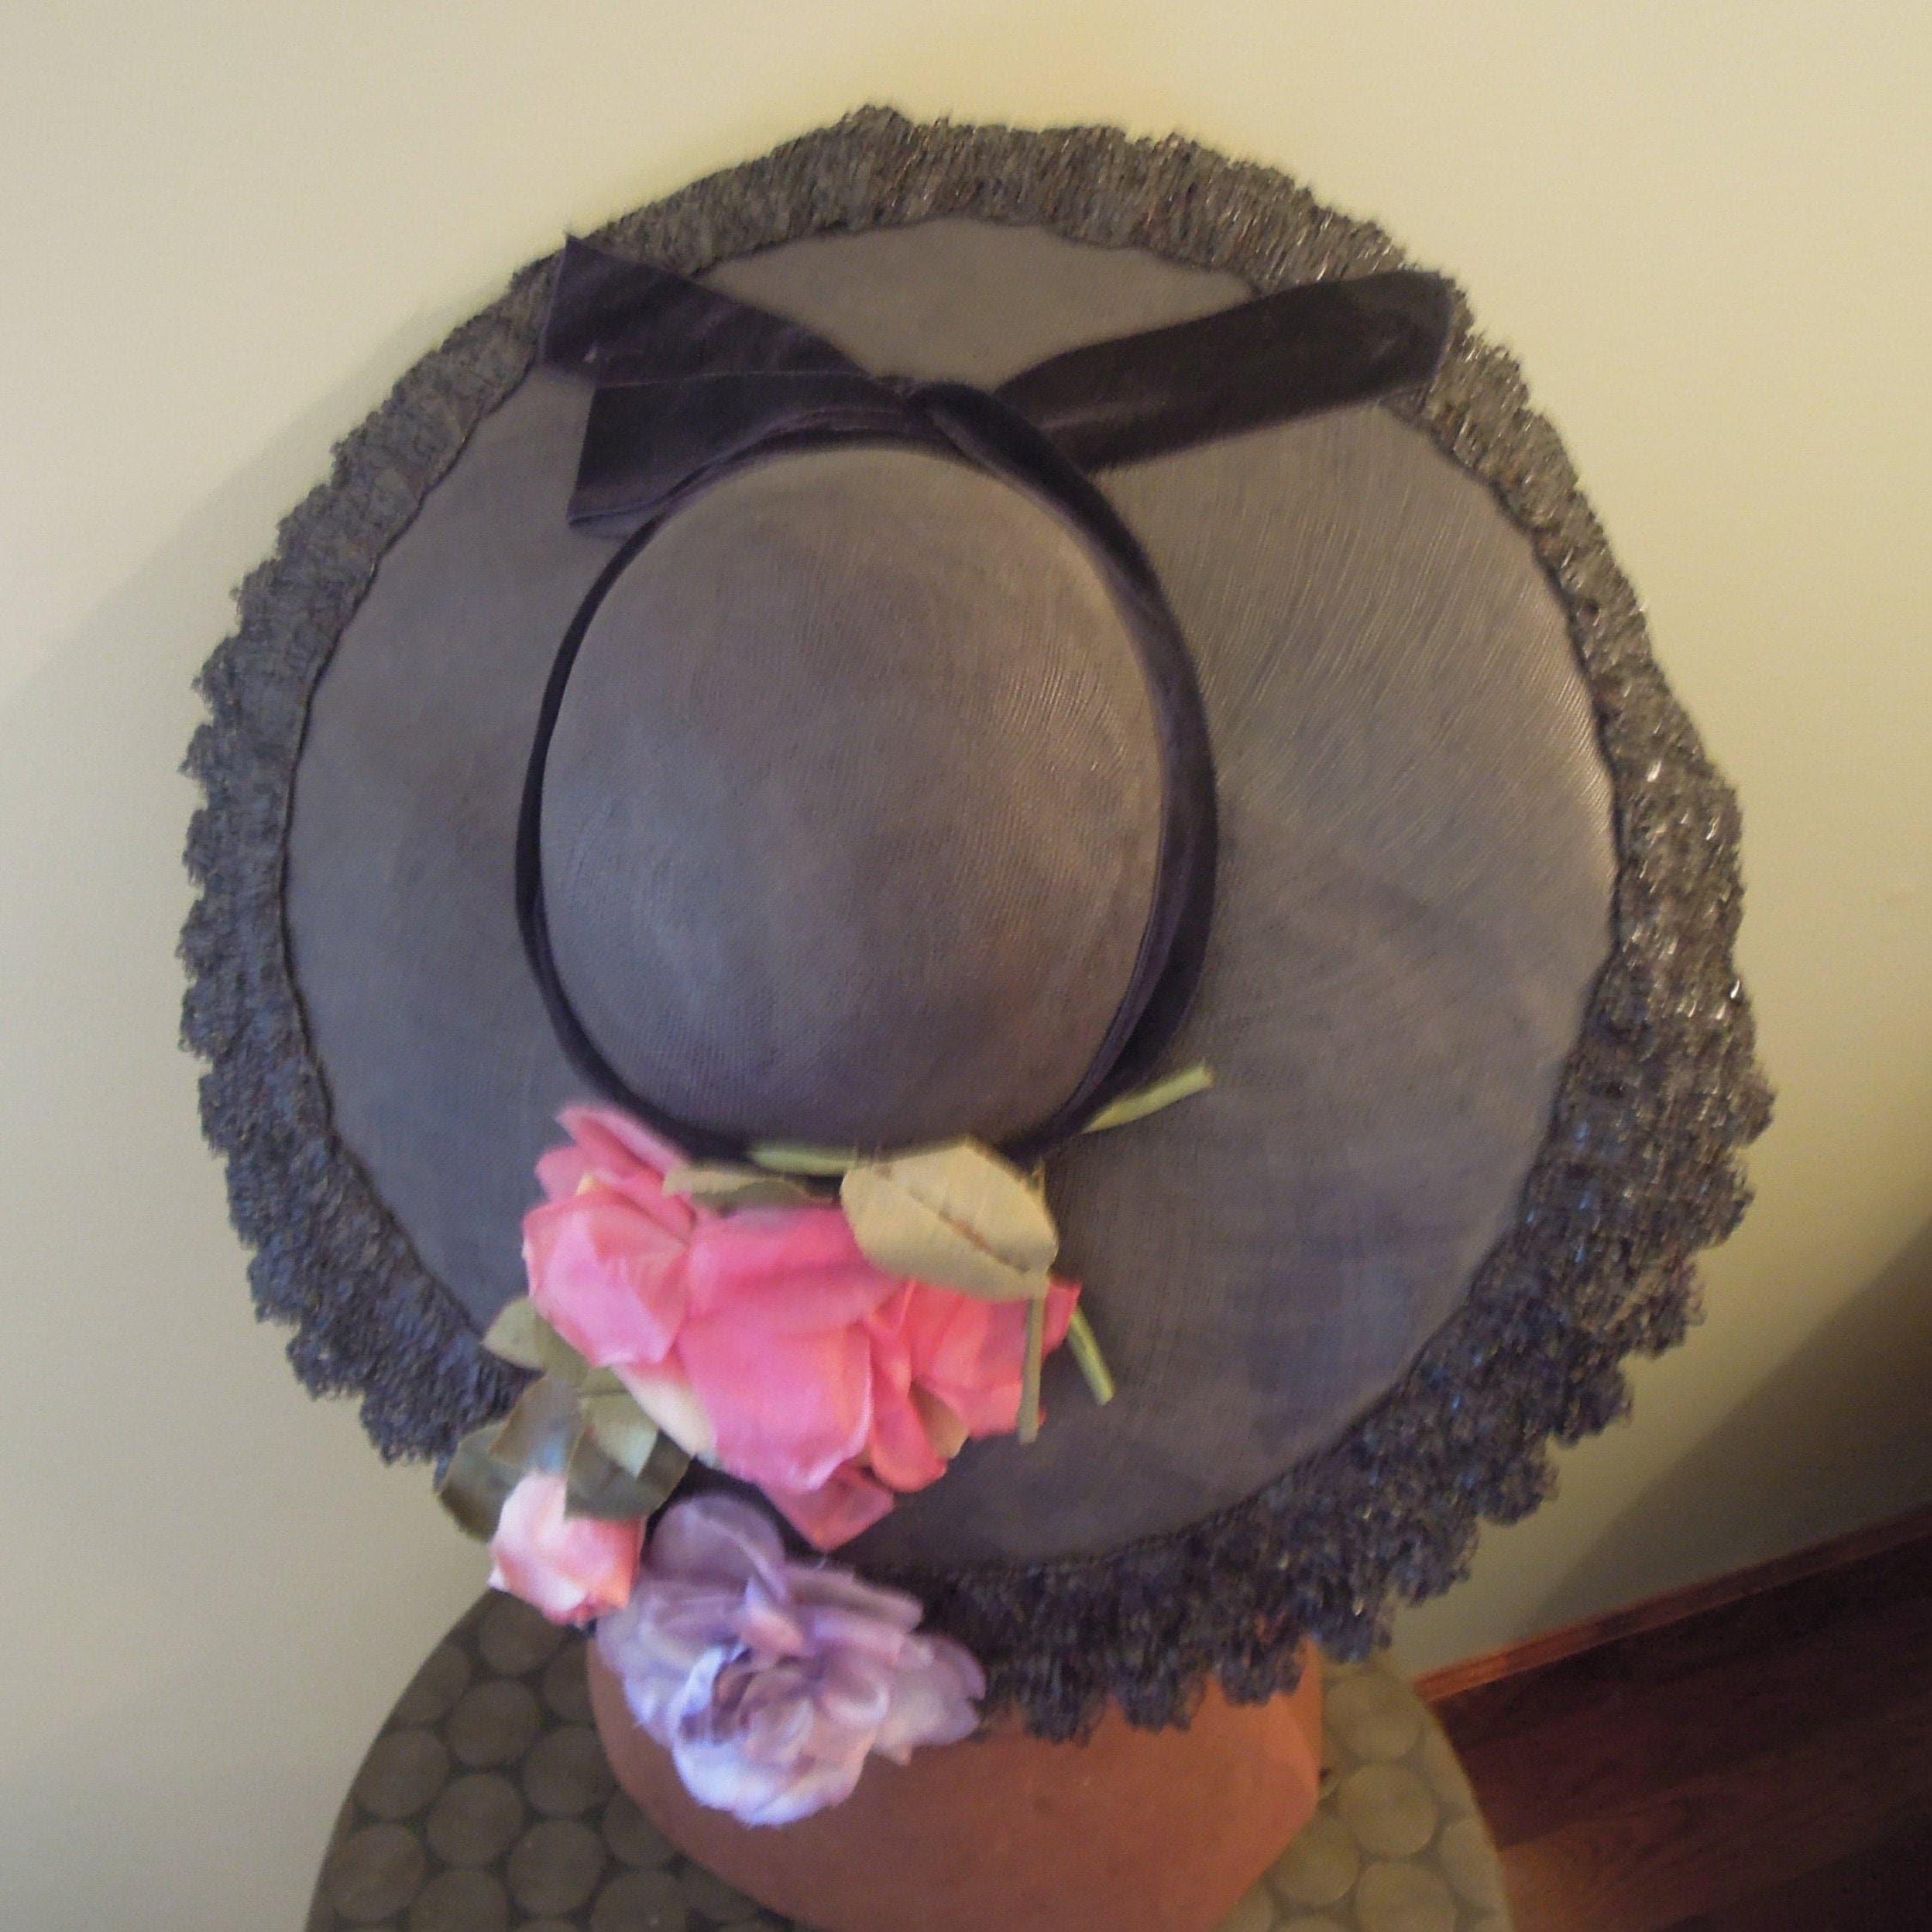 1950s Hats: Pillbox, Fascinator, Wedding, Sun Hats Vintage 1950s Straw Platter Ladies HatNavy  Velvet Ribbon Purple Pink Flowers Kentucky Derby Garden Party Floral $29.50 AT vintagedancer.com